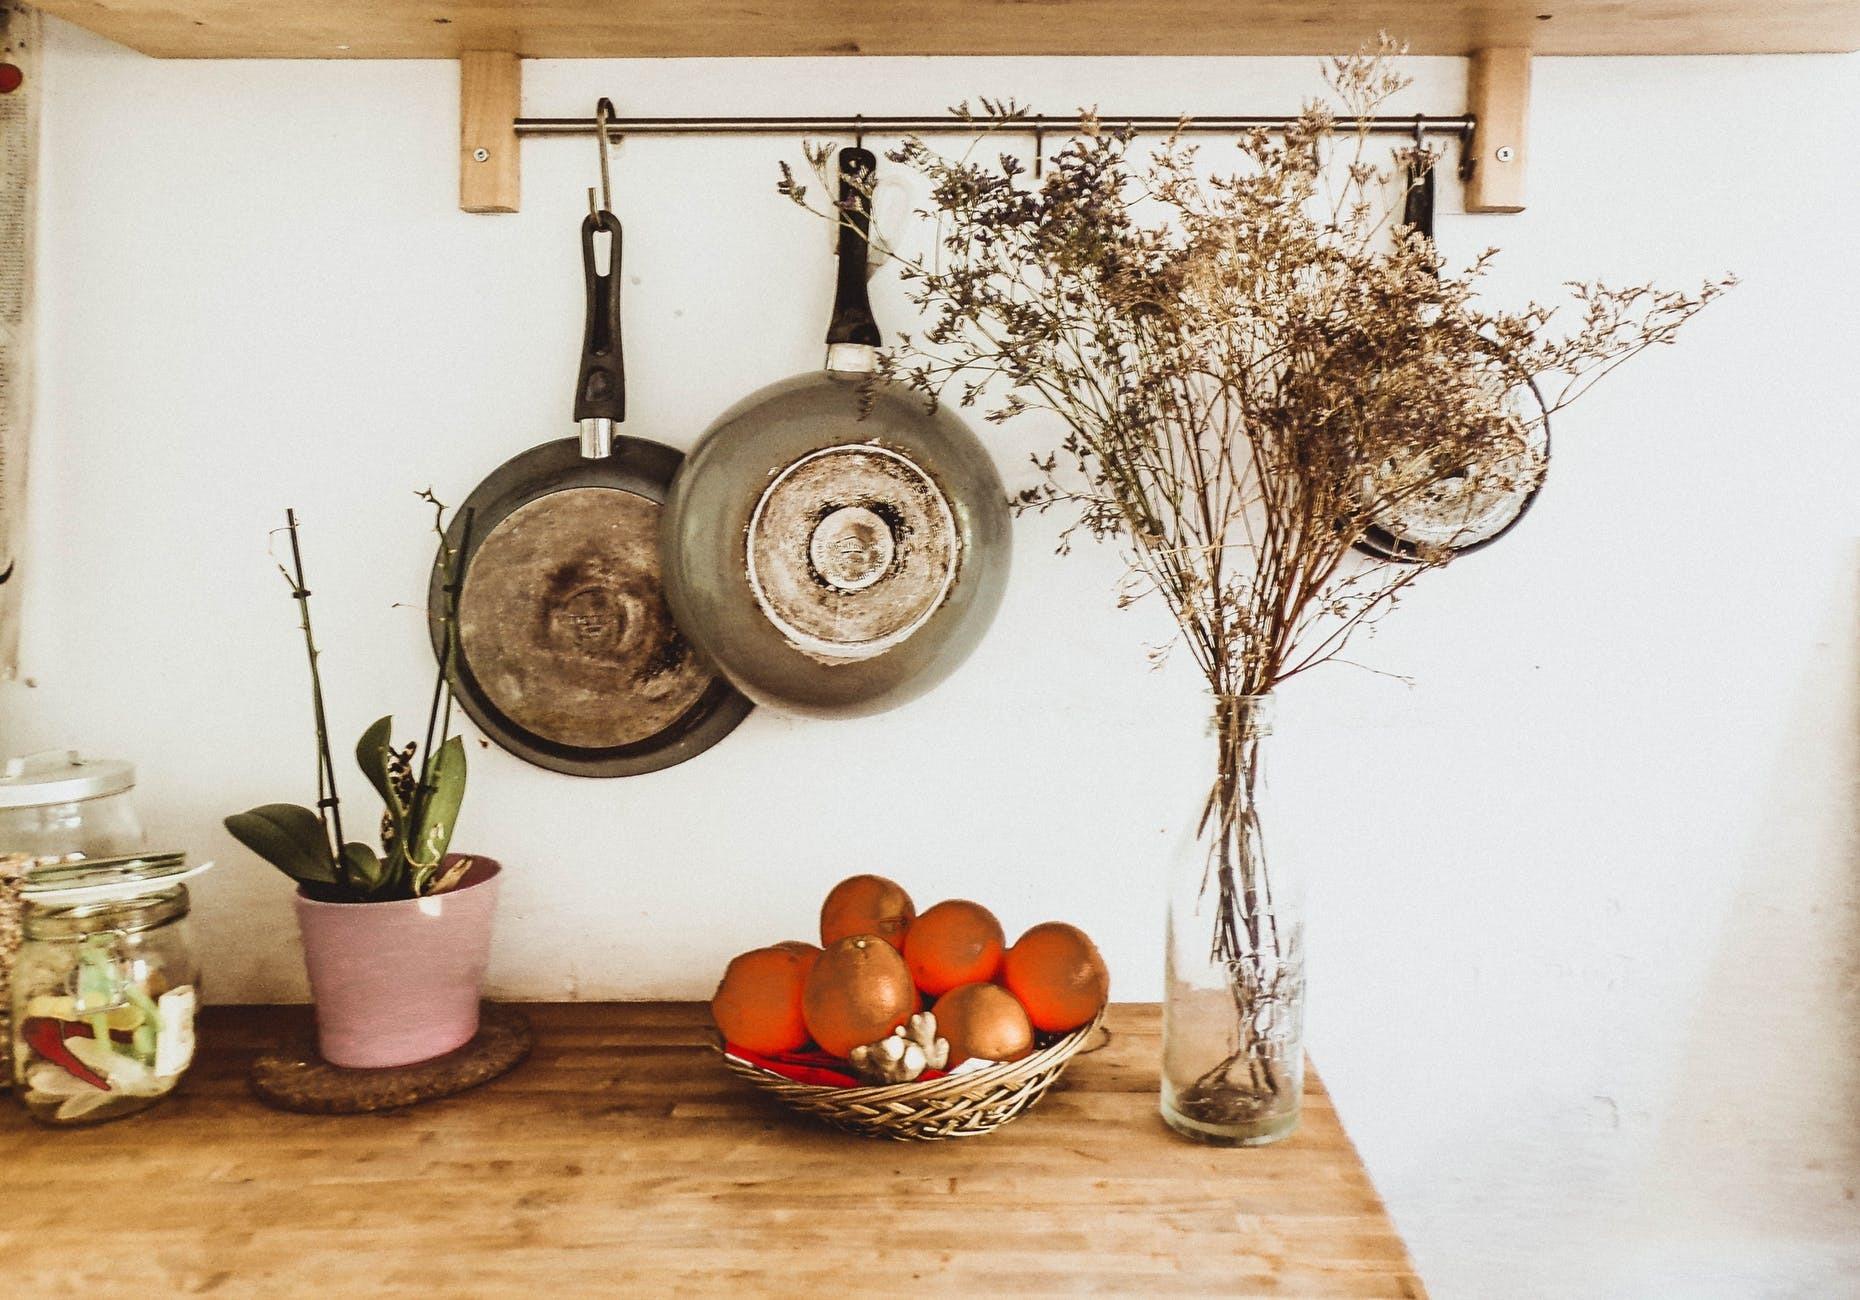 Full Size of Komplettküche Mit Elektrogeräten Miele Komplettküche Willhaben Komplettküche Komplettküche Angebot Küche Einbauküche Ohne Kühlschrank